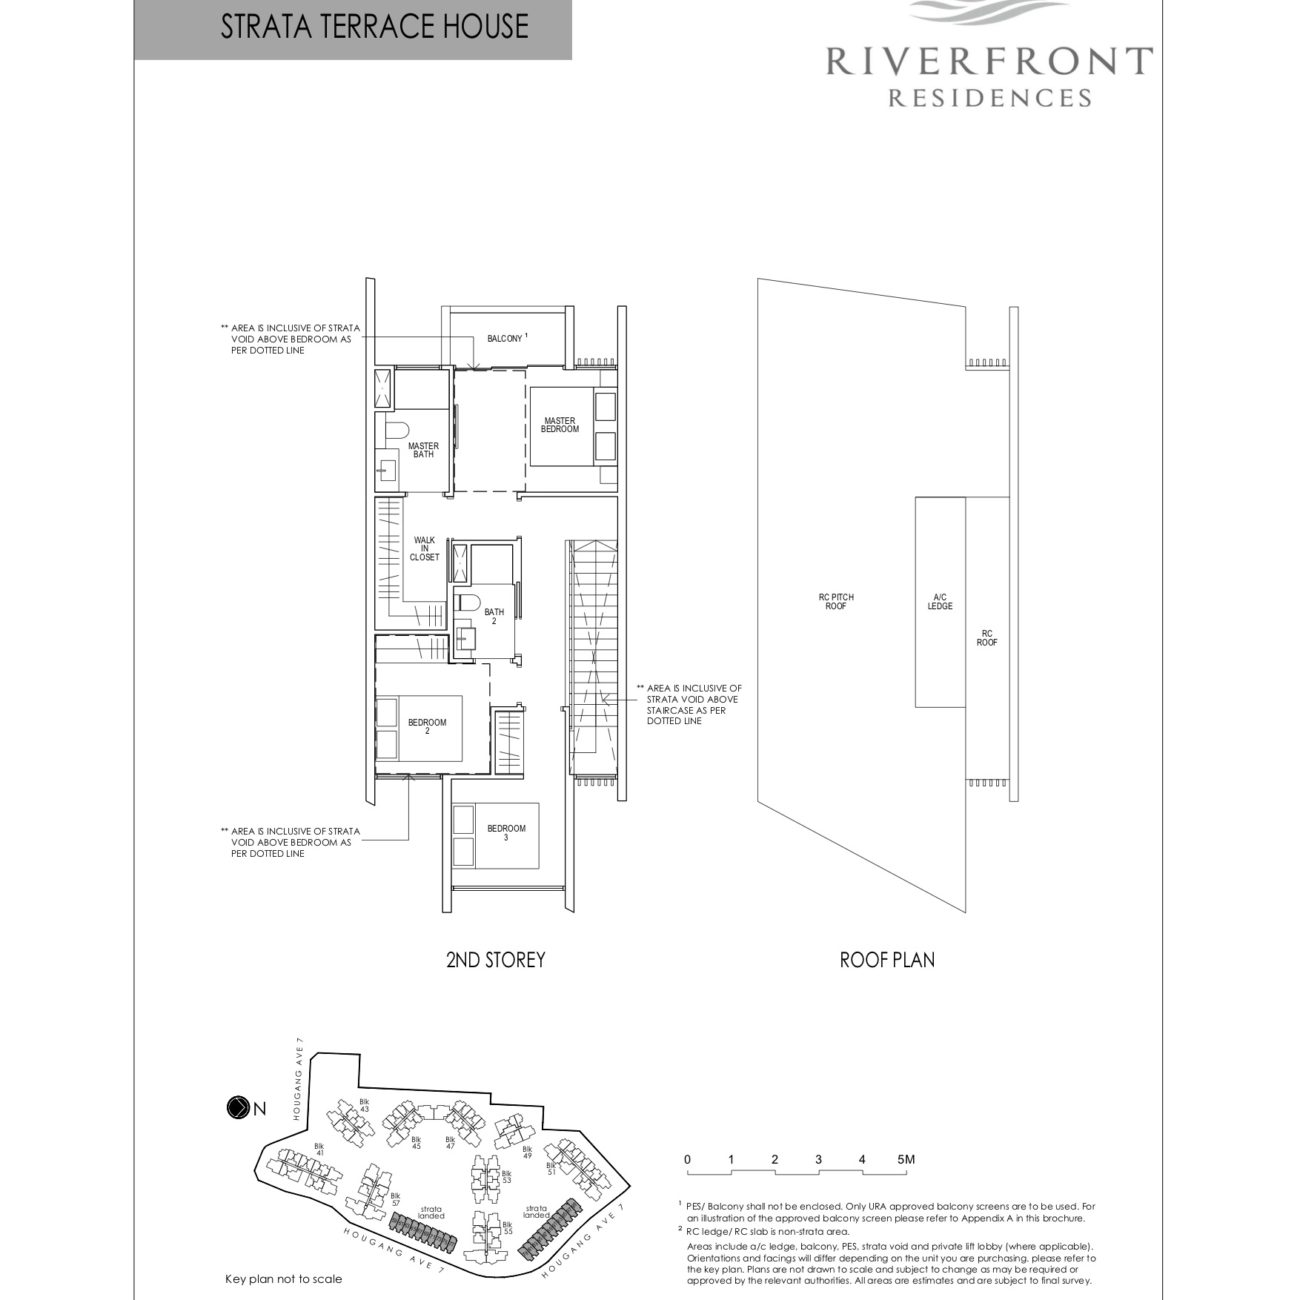 riverfront-residences-floorplan-strata-terrace-2